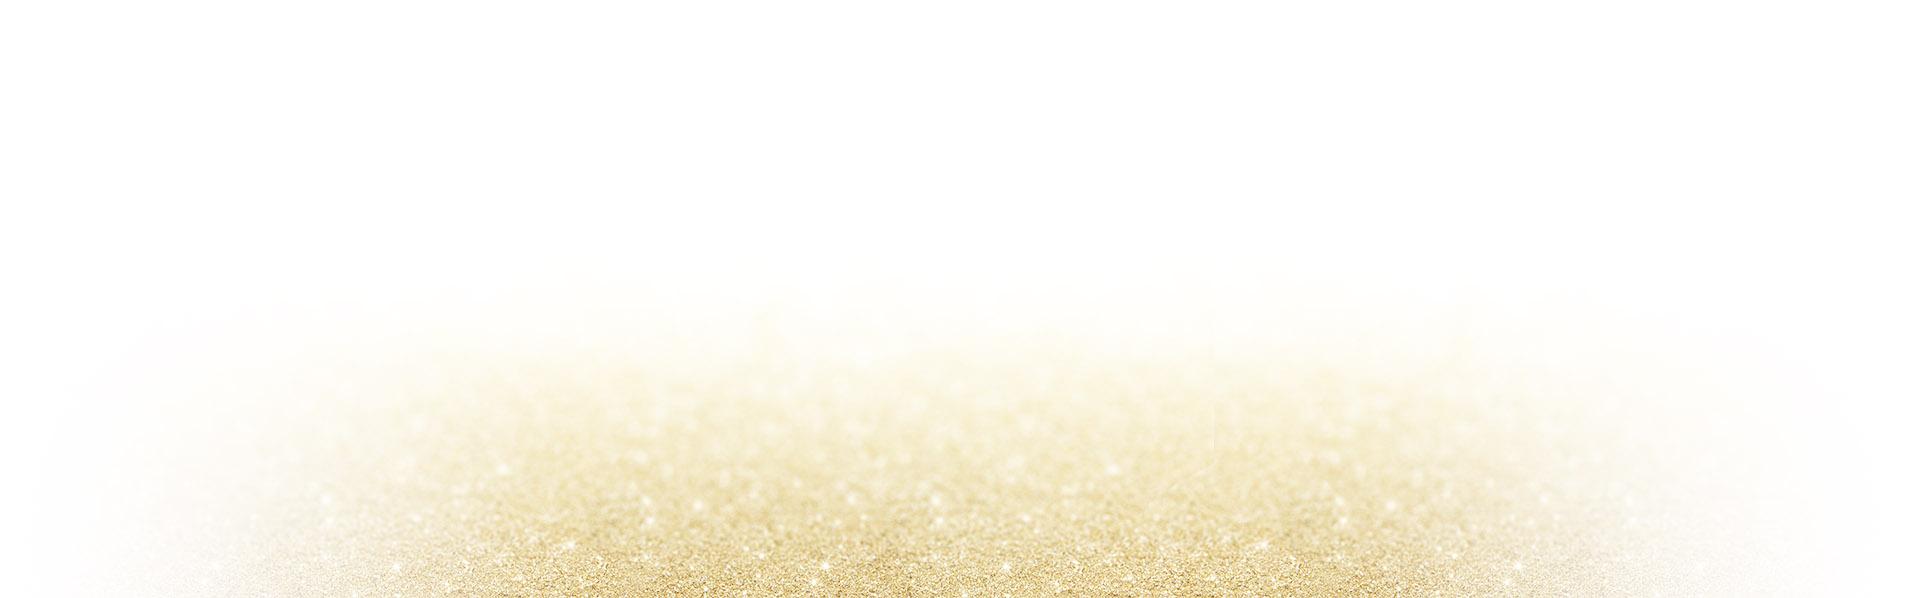 banner3-site-pelo-de-ouro